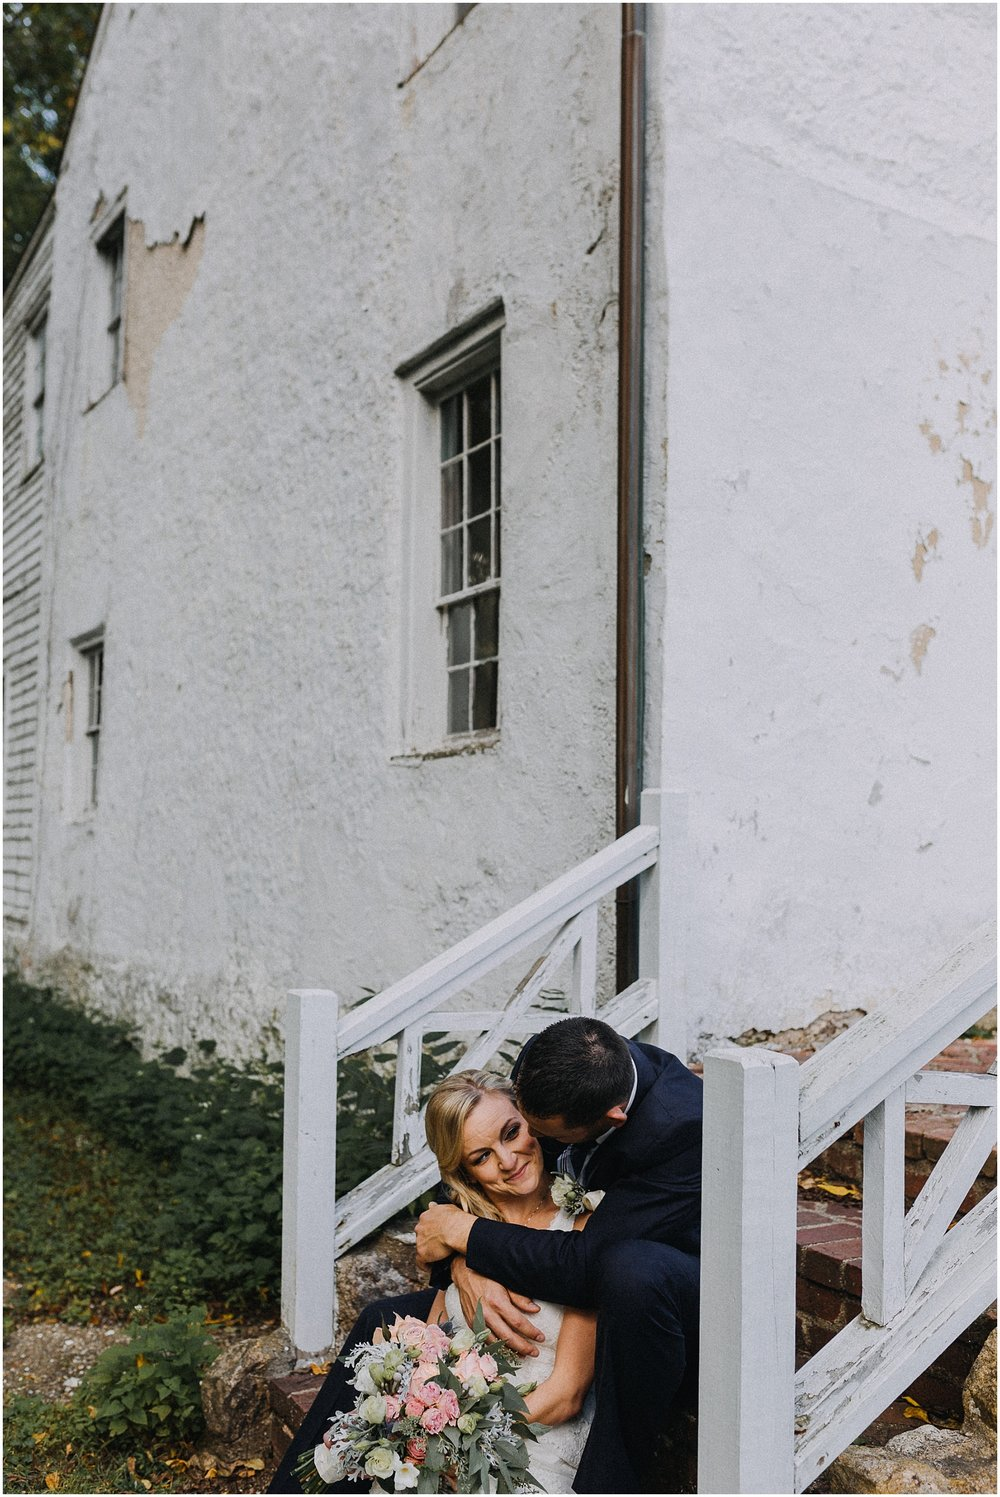 waterloo-village-waterloo village-wedding-outdoor wedding-rustic-boemian-new jersey-bride-groom-wedding party-davids bridal-wedding dress-wedding-first kiss-intimate wedding_0369.jpg